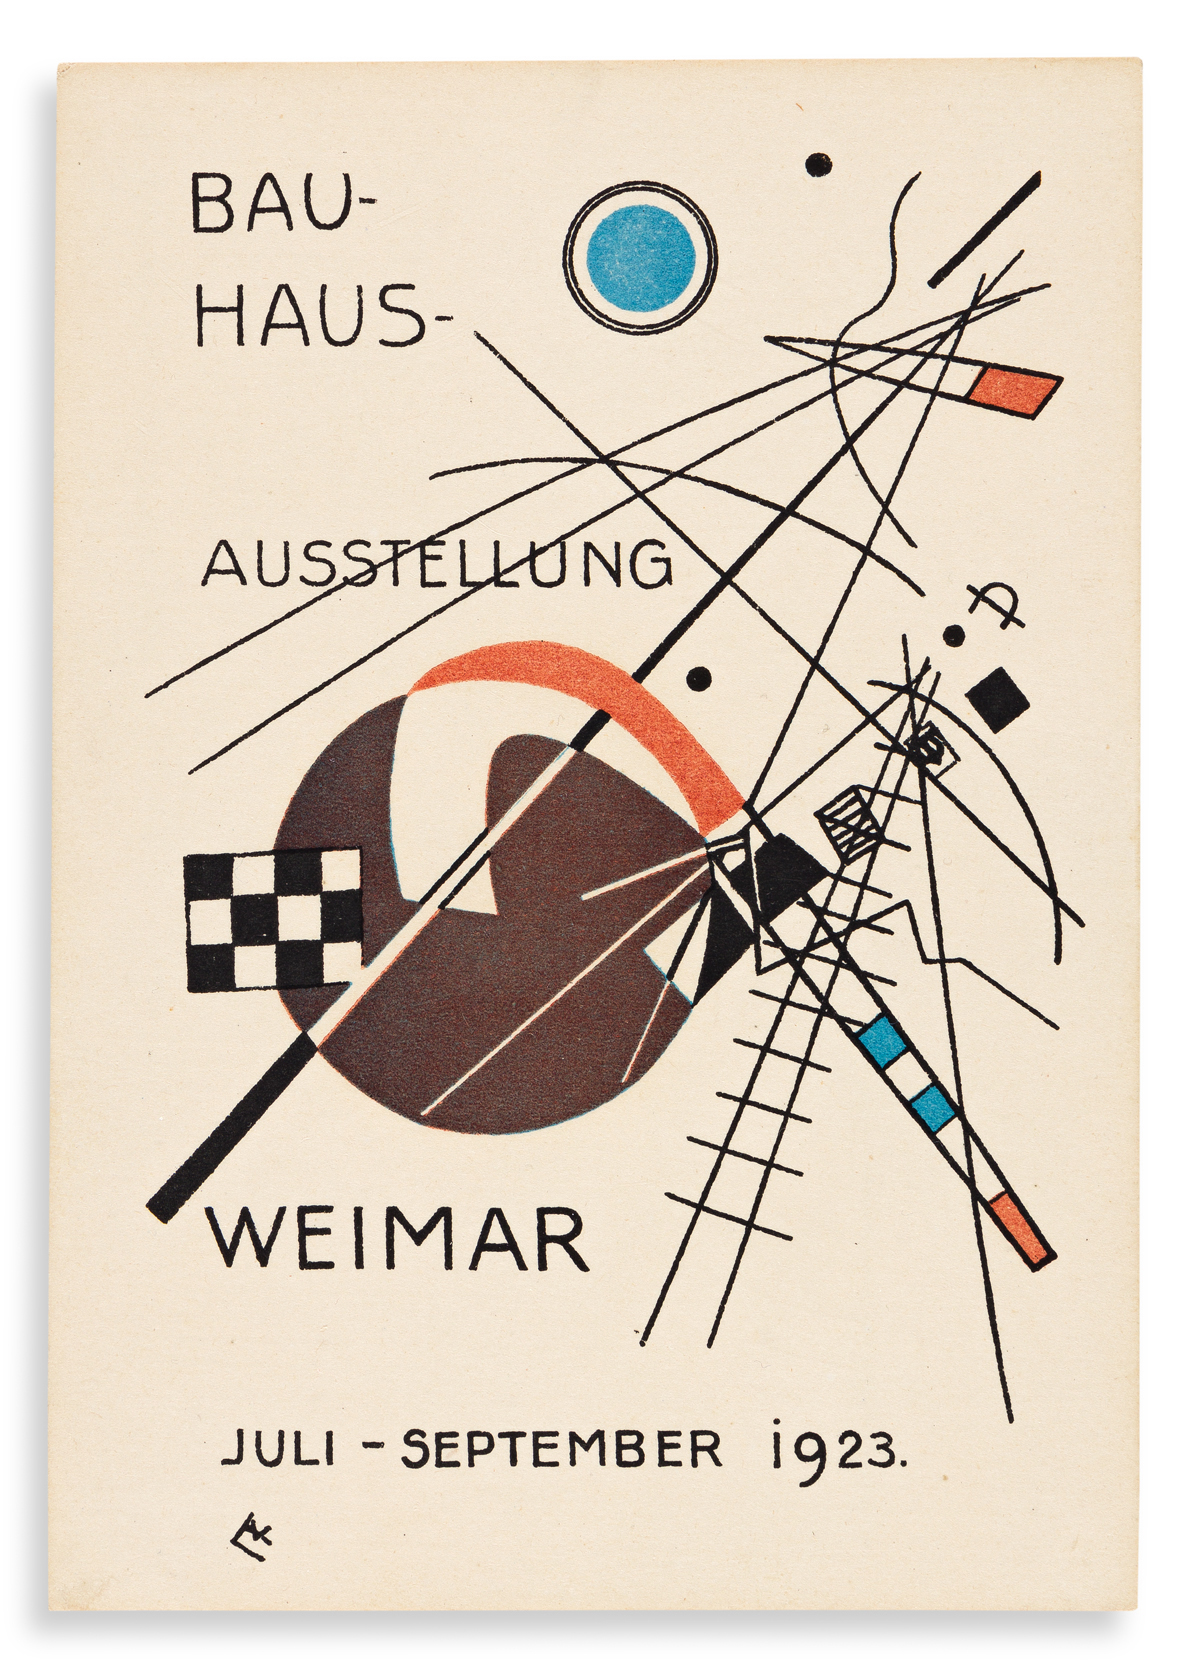 KANDINSKY, VASSILY. Bauhaus Ausstellung Juli - Sept. 1923 Weimar. [Weimar: Staatliches Bauhaus] 1923.